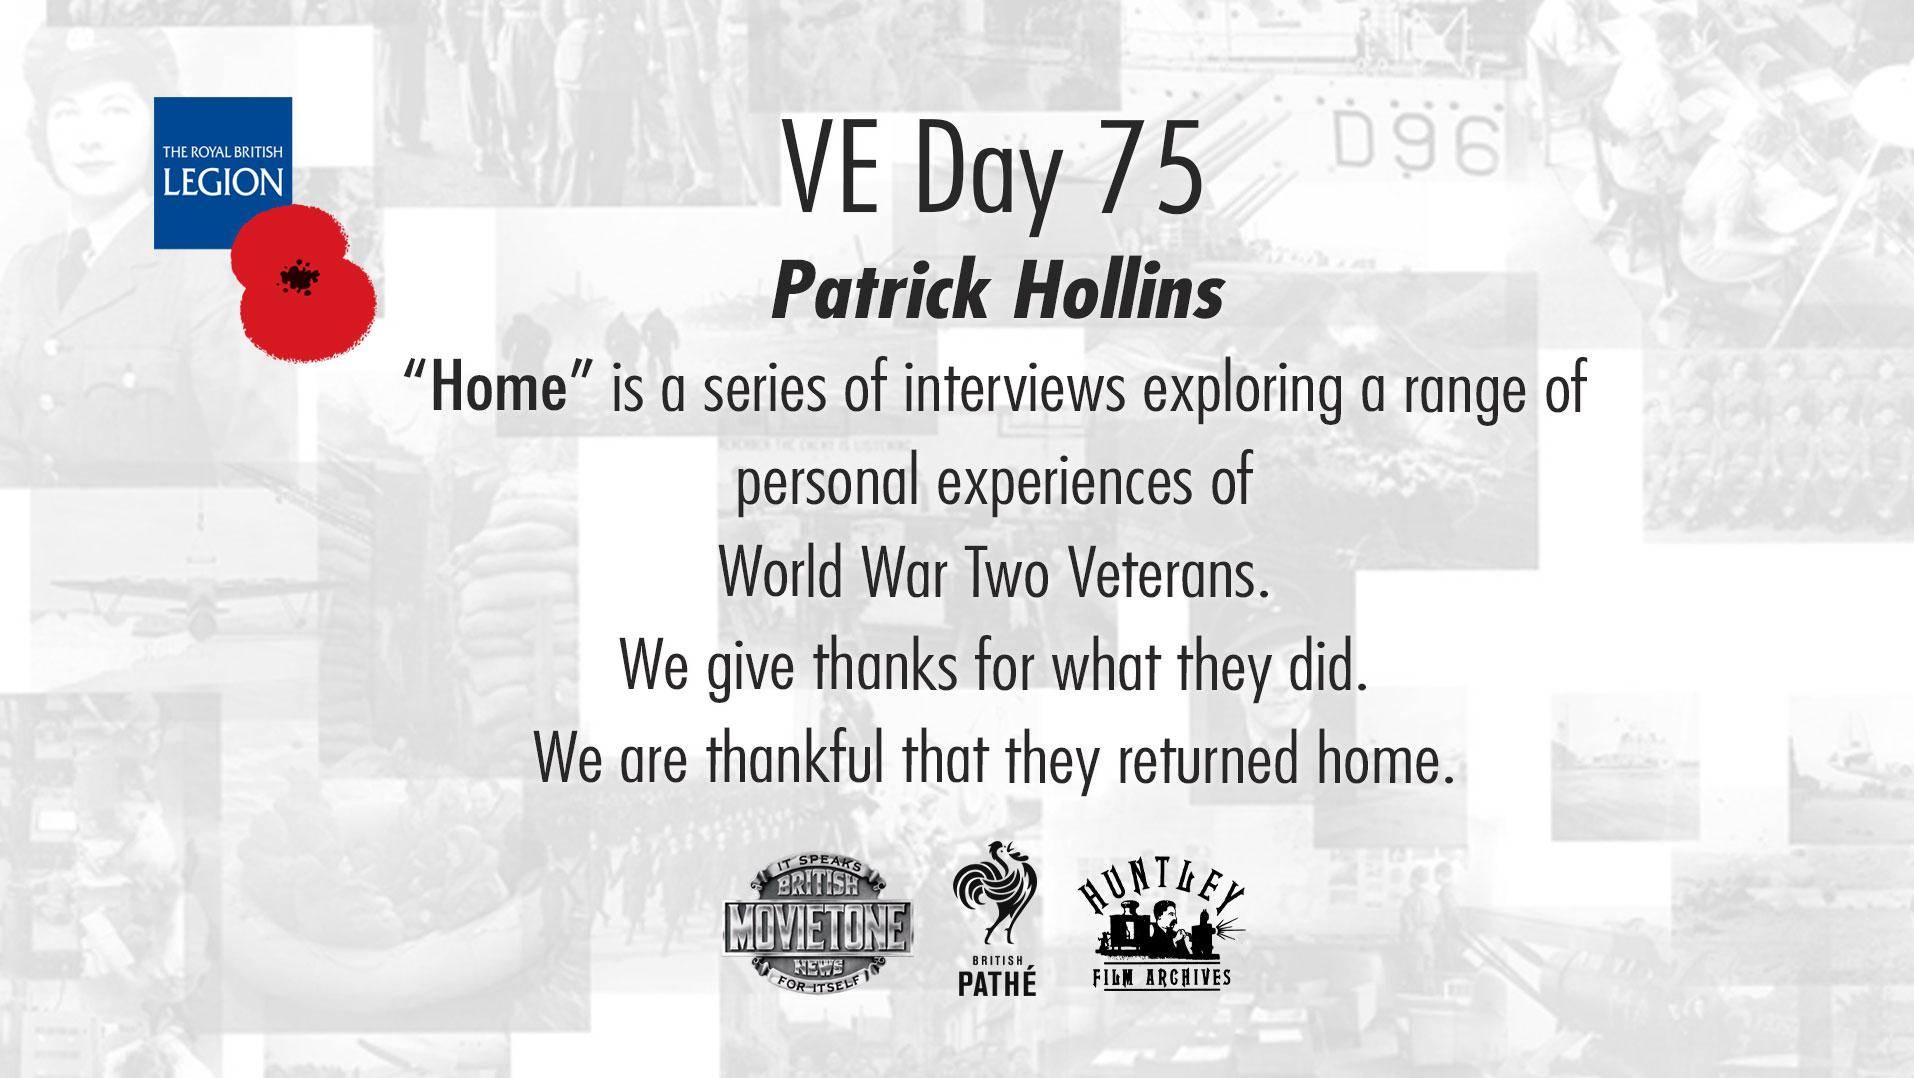 Patrick Hollins